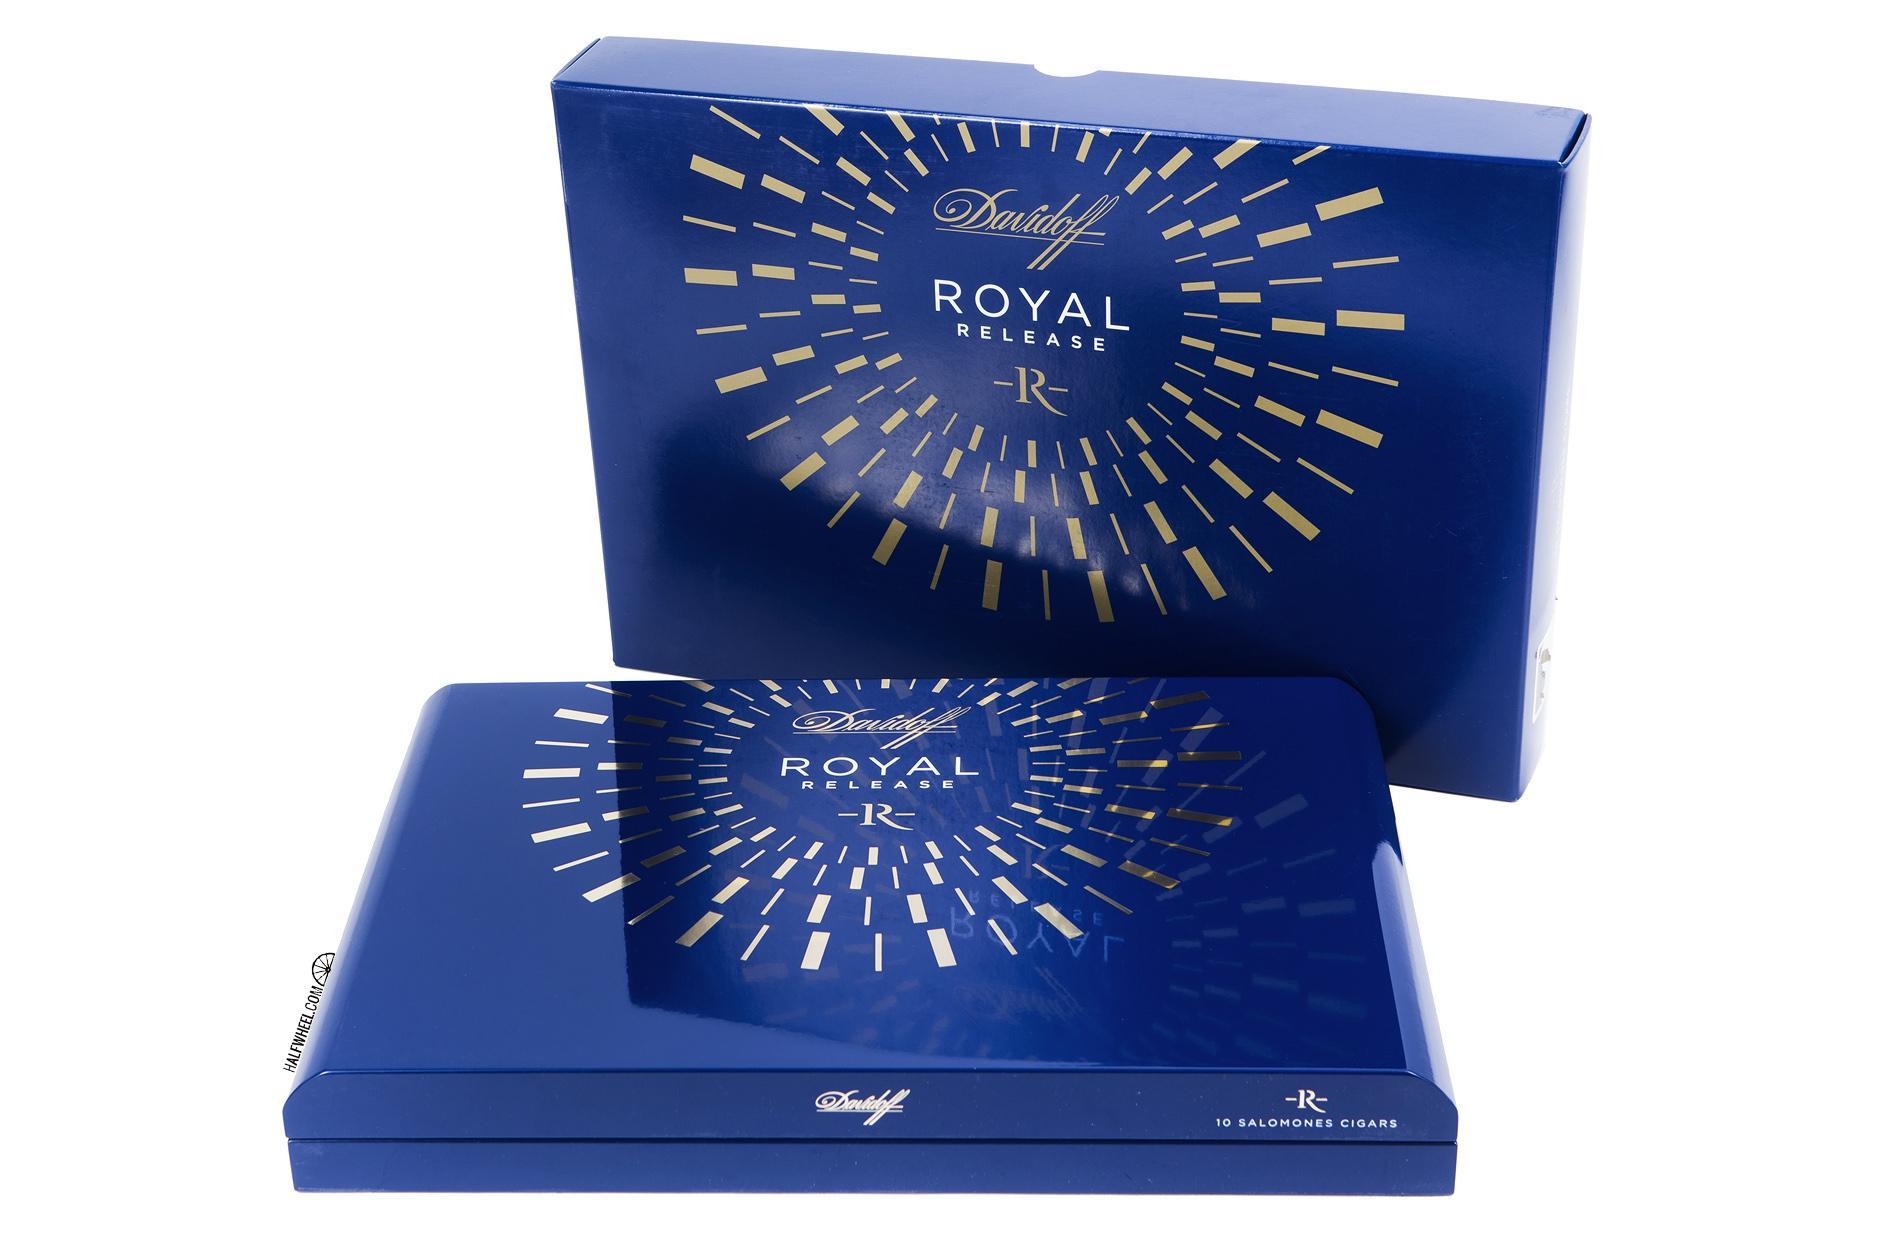 davidoff-royal-release-salomones-box-1